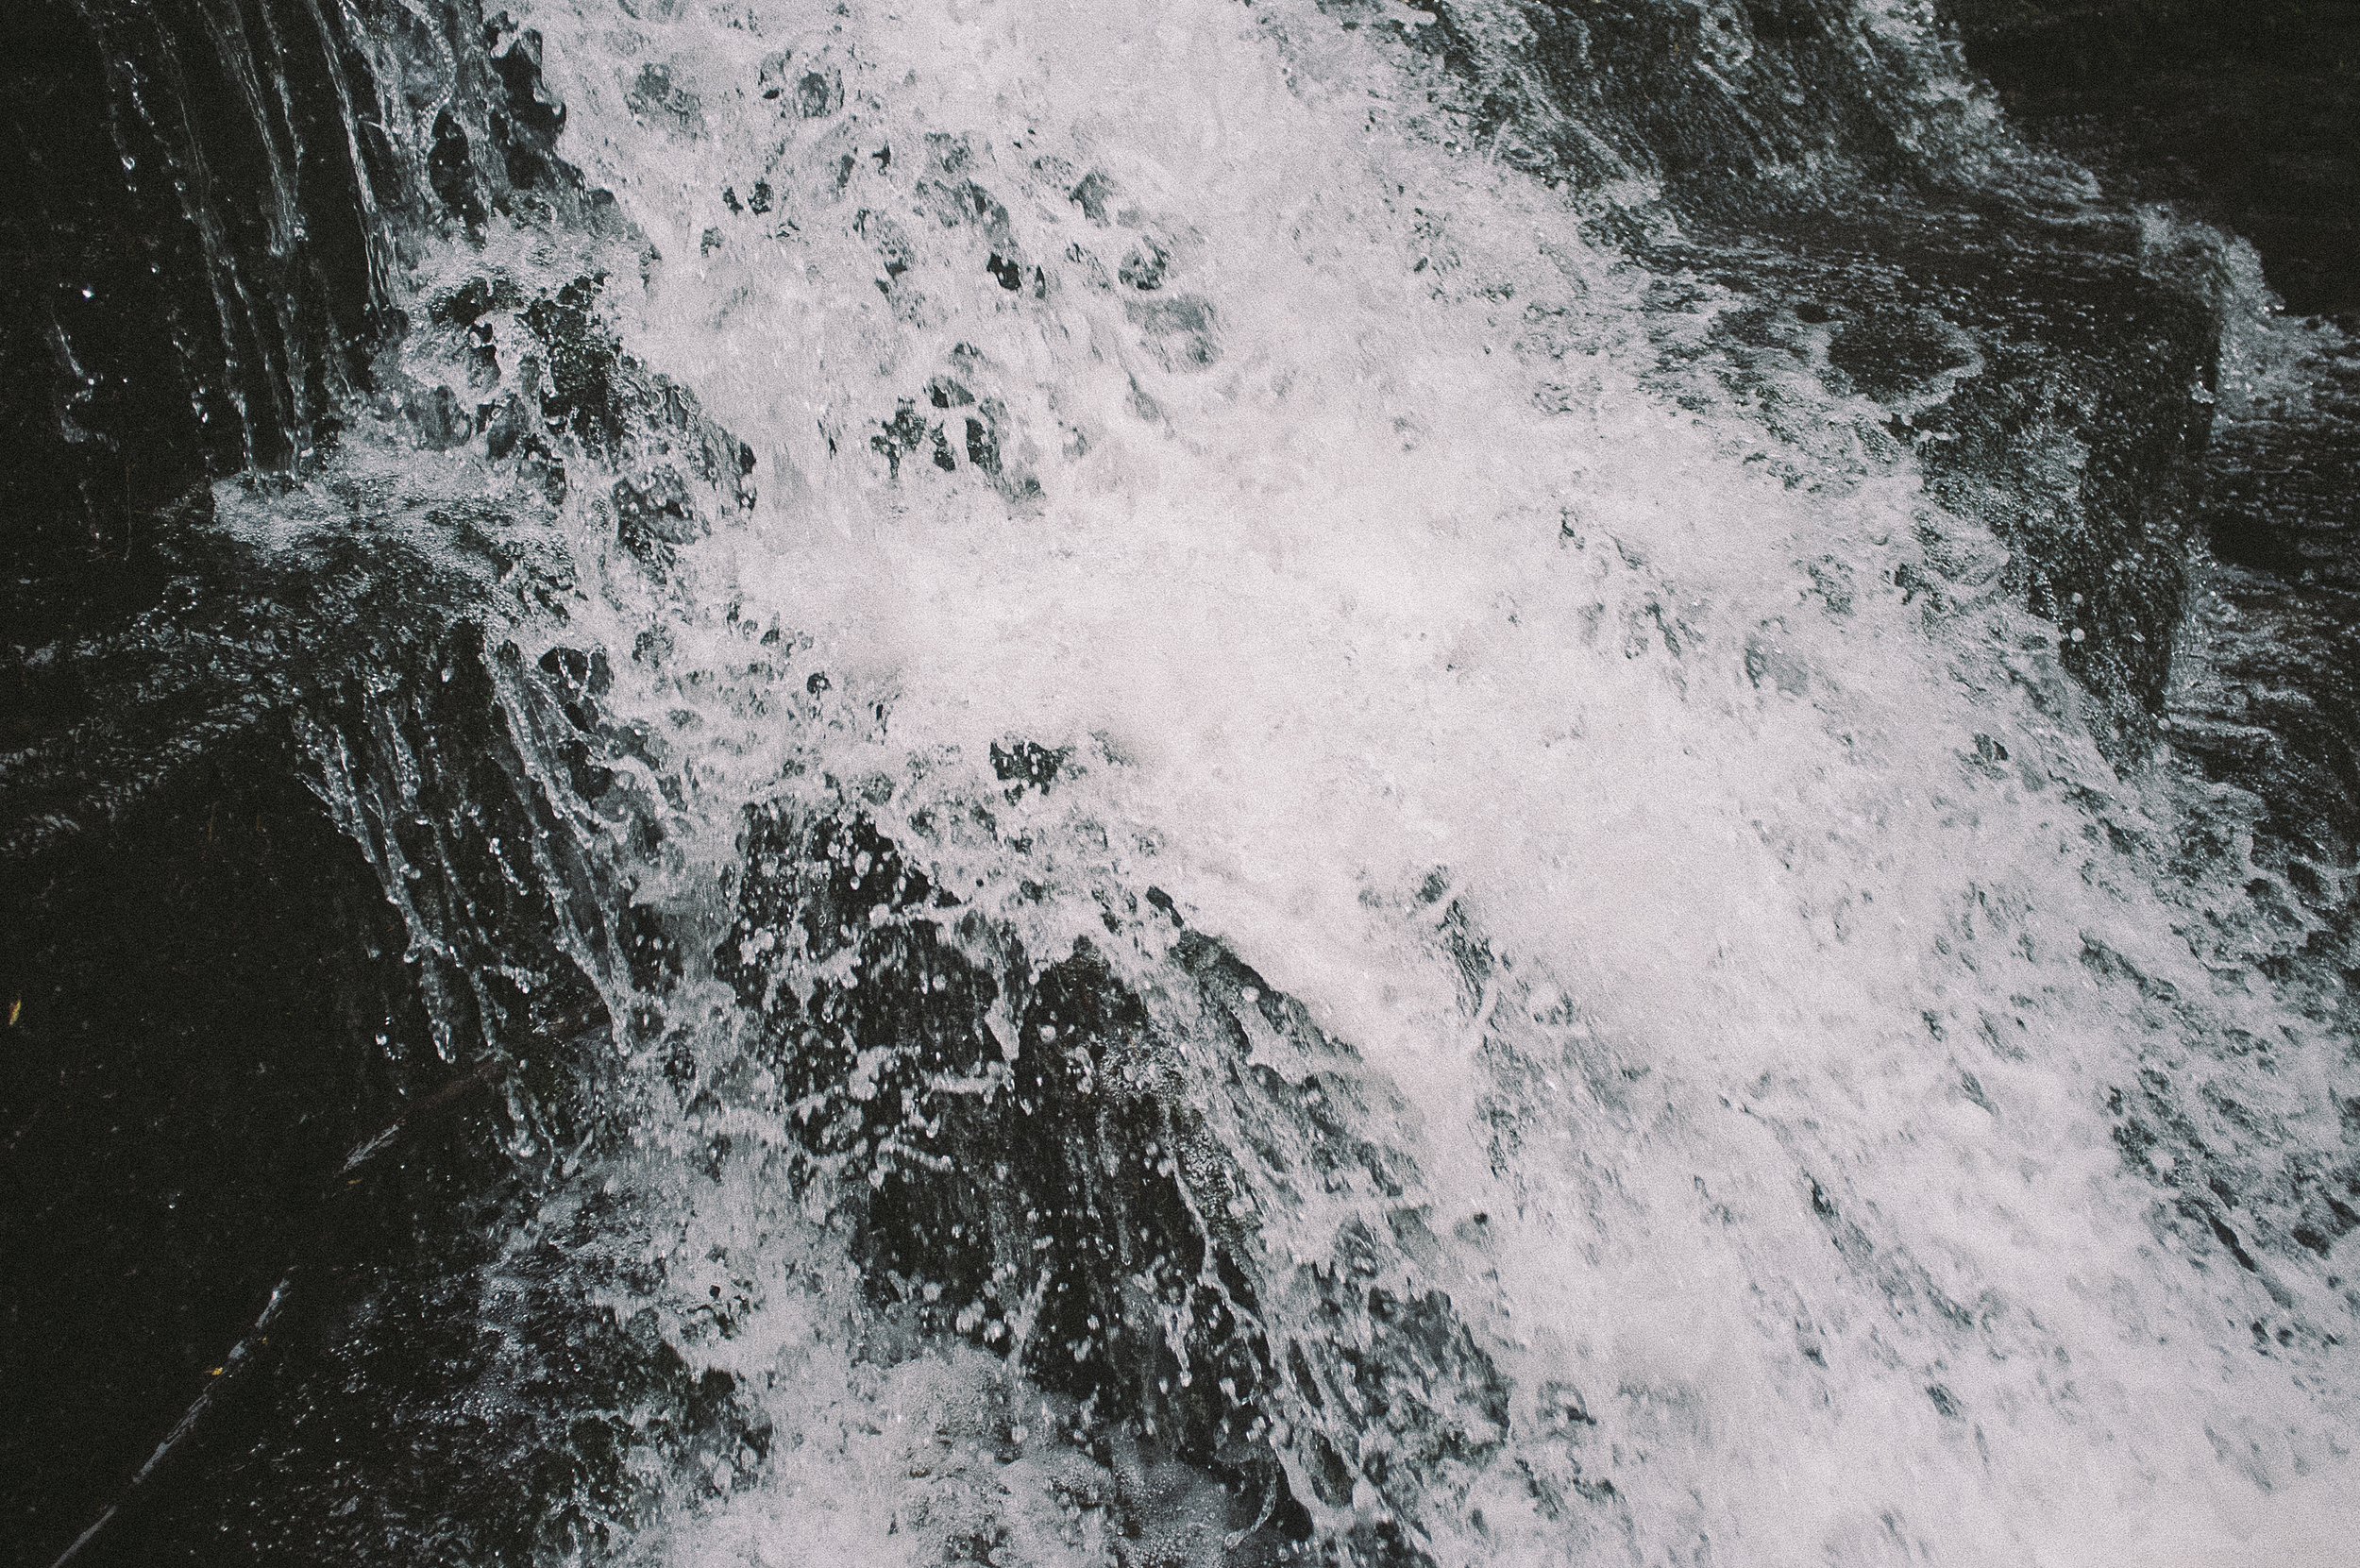 Fuji X100 Waterfall Photography-25.jpg